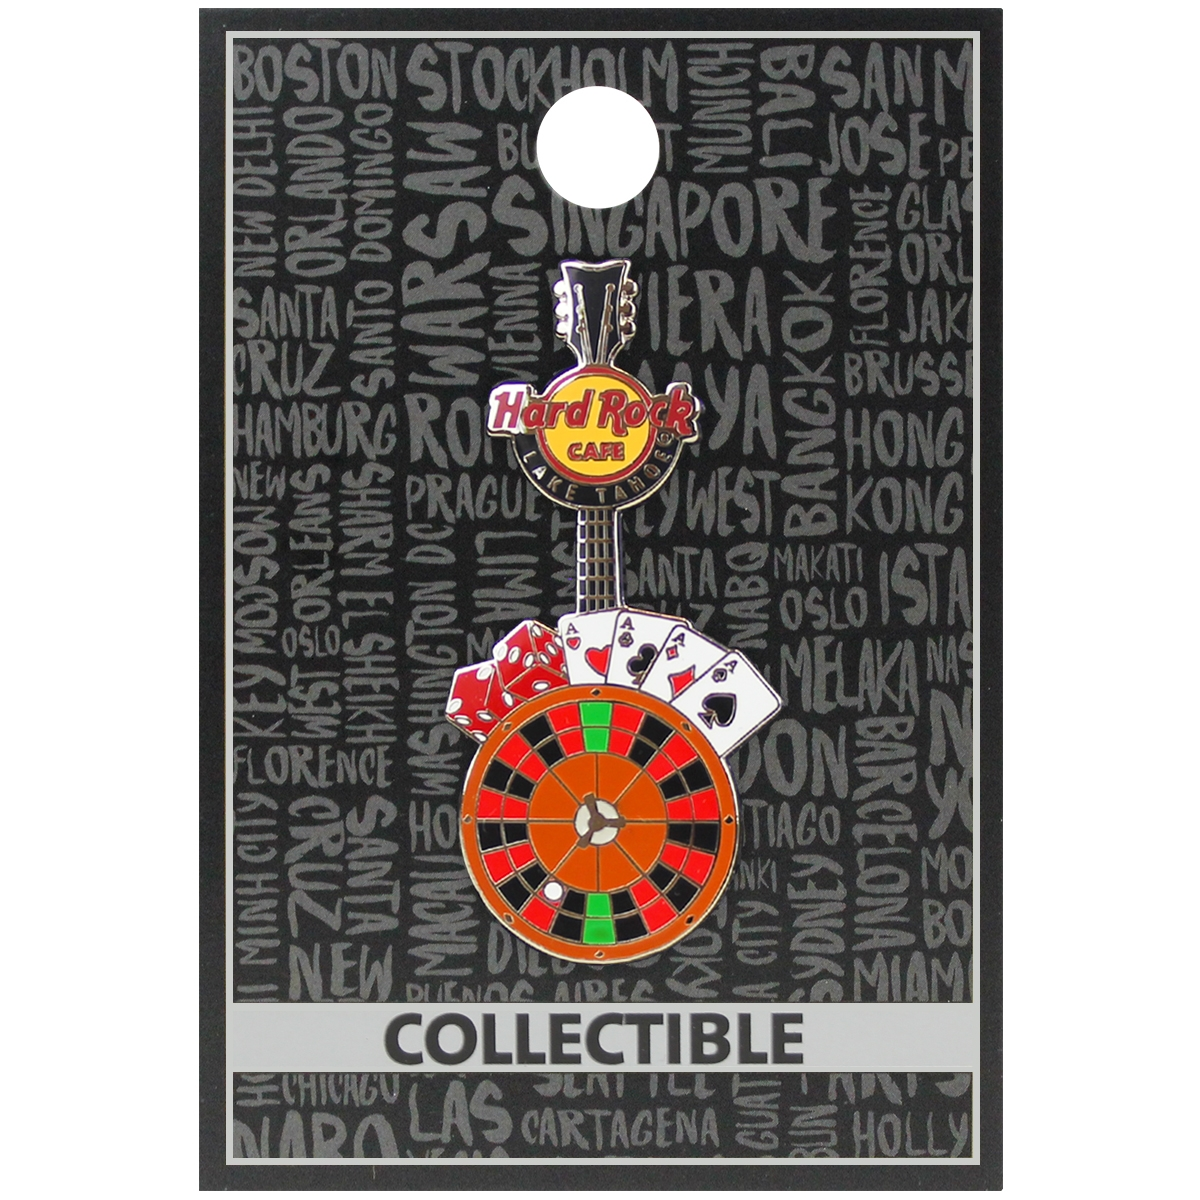 Core Roulette Guitar LTO 0